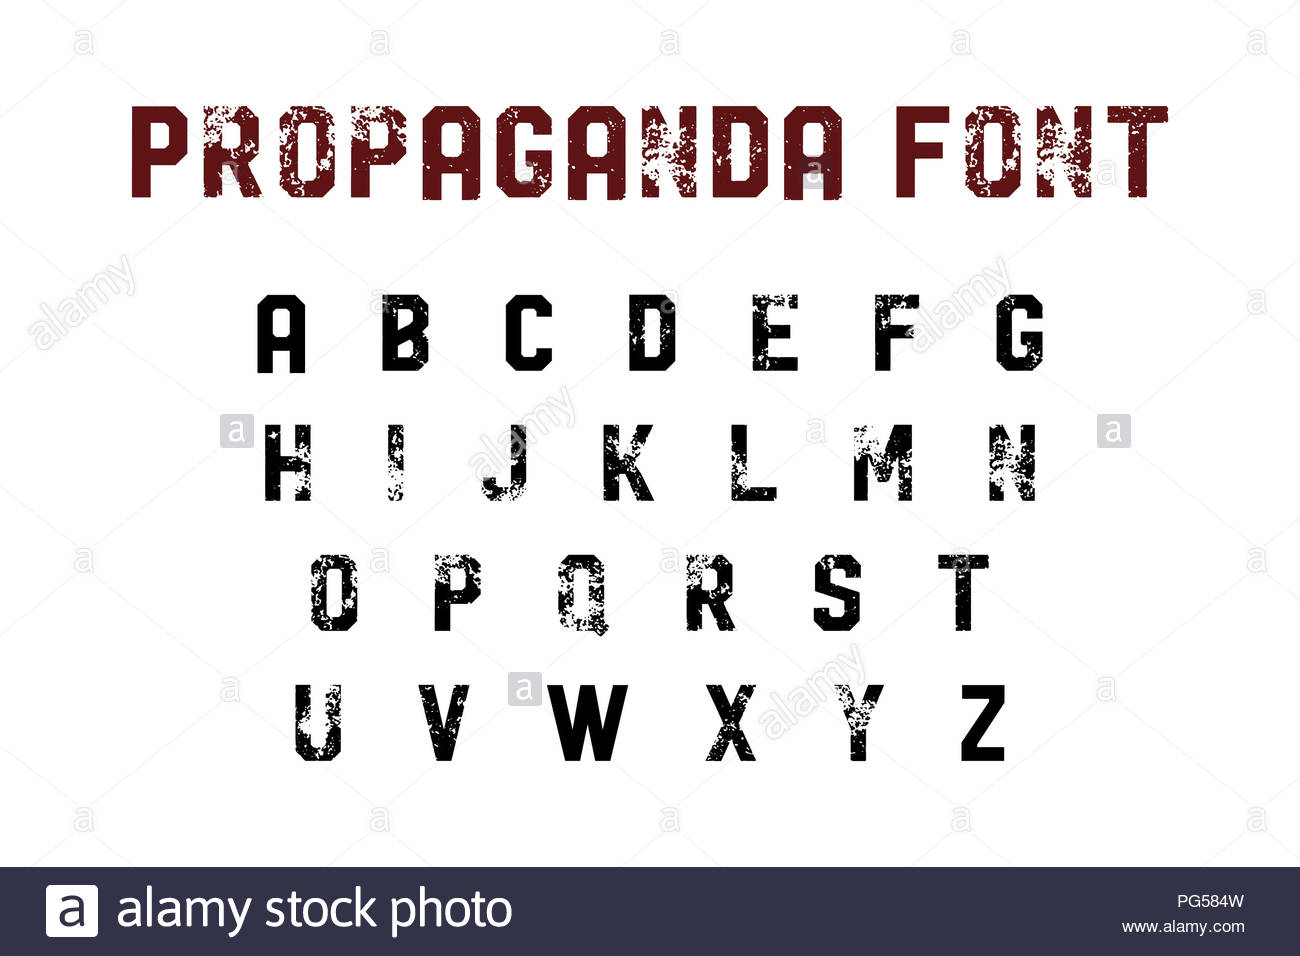 propaganda font - Stock Image